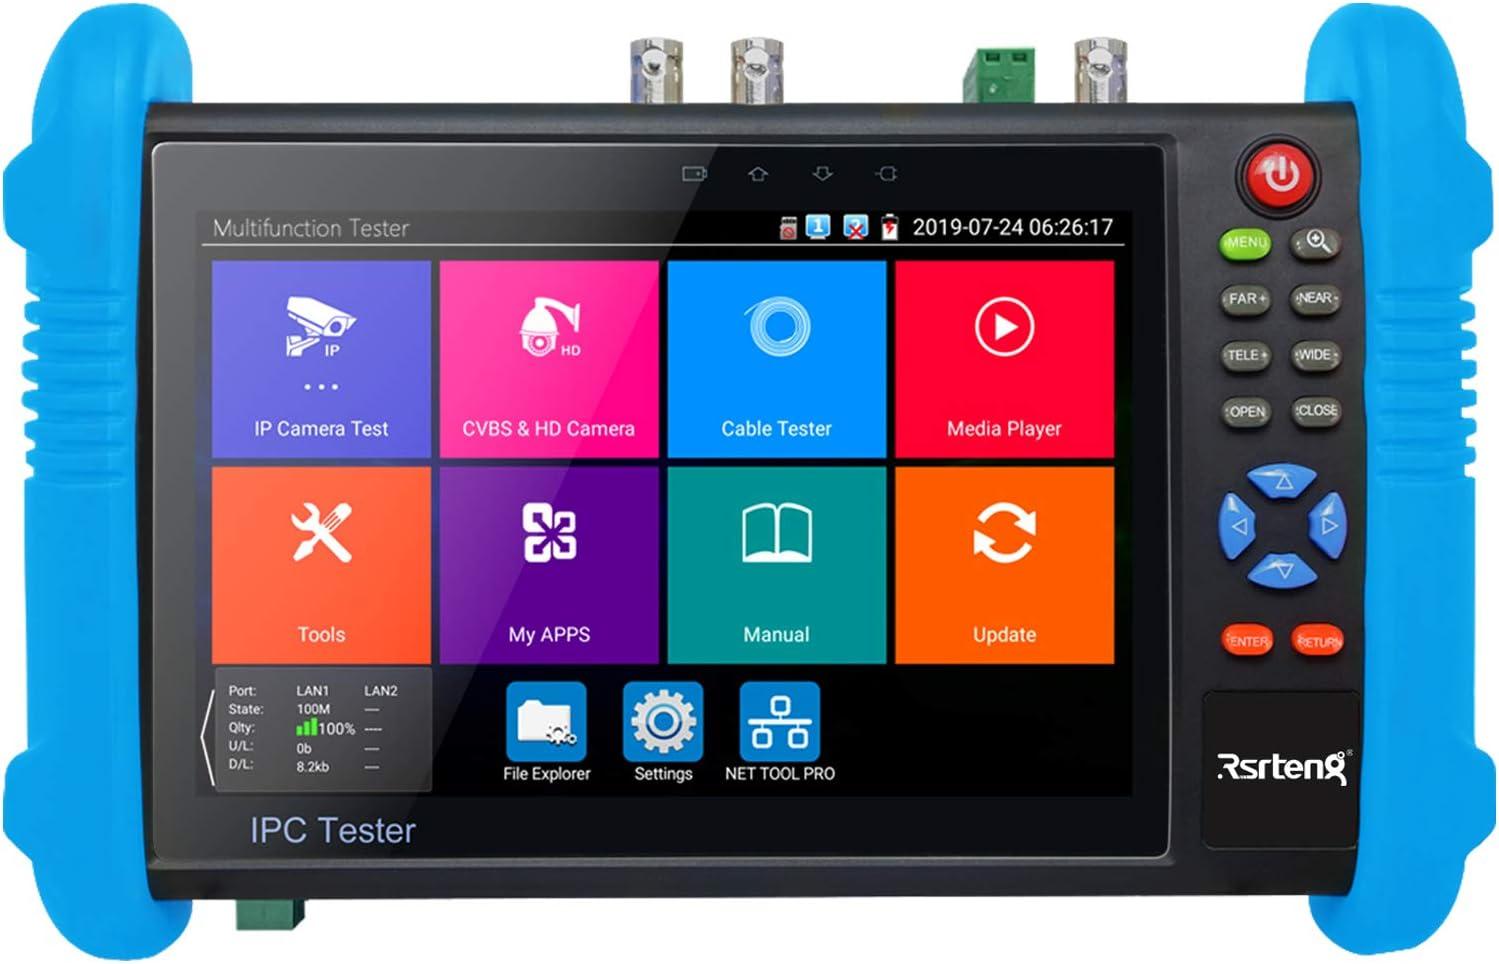 Rsrteng CCTV Camera Tester, Security IP Camera Tester 8MP CVI TVI AHD SDI CVBS Camera Tester 7inch IPS Touch Screen Support TDR POE WiFi 4K H.265 HDMI IPC Tester IPC-9800ADHS Plus+